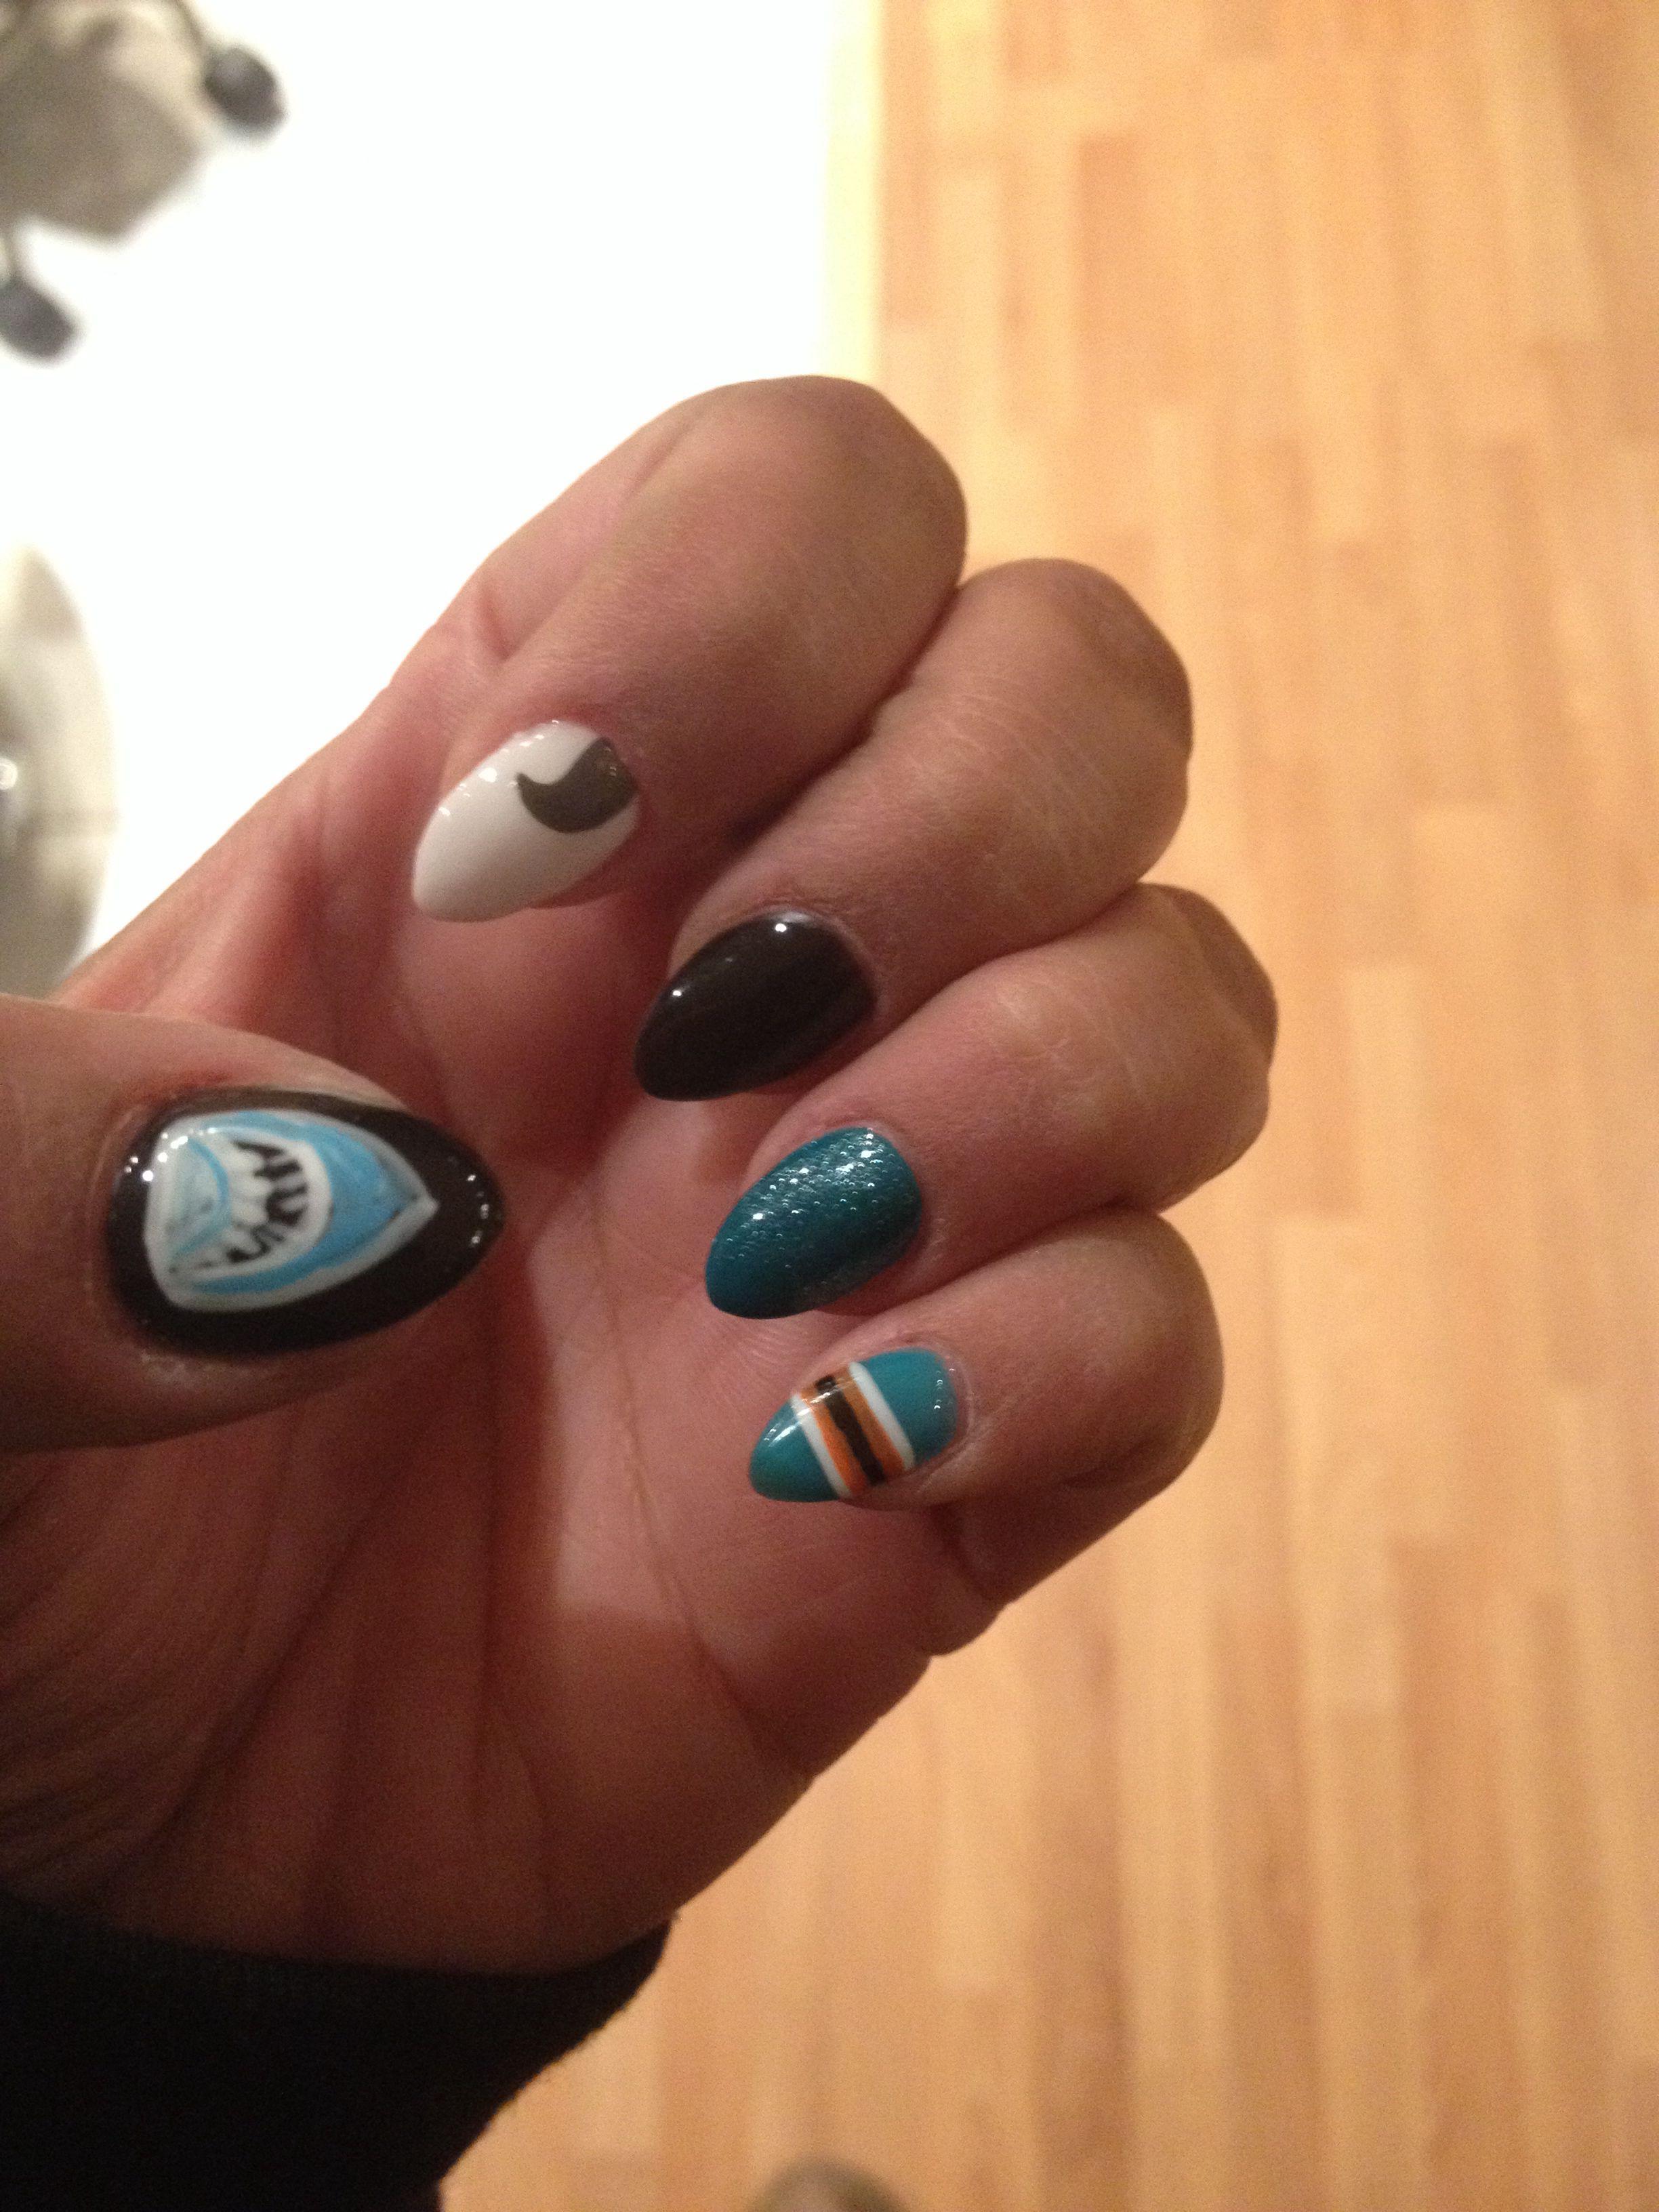 San Jose Sharks Nails Showing My Pride Teal Black San Jose Sharks Nails Nails Nail Art